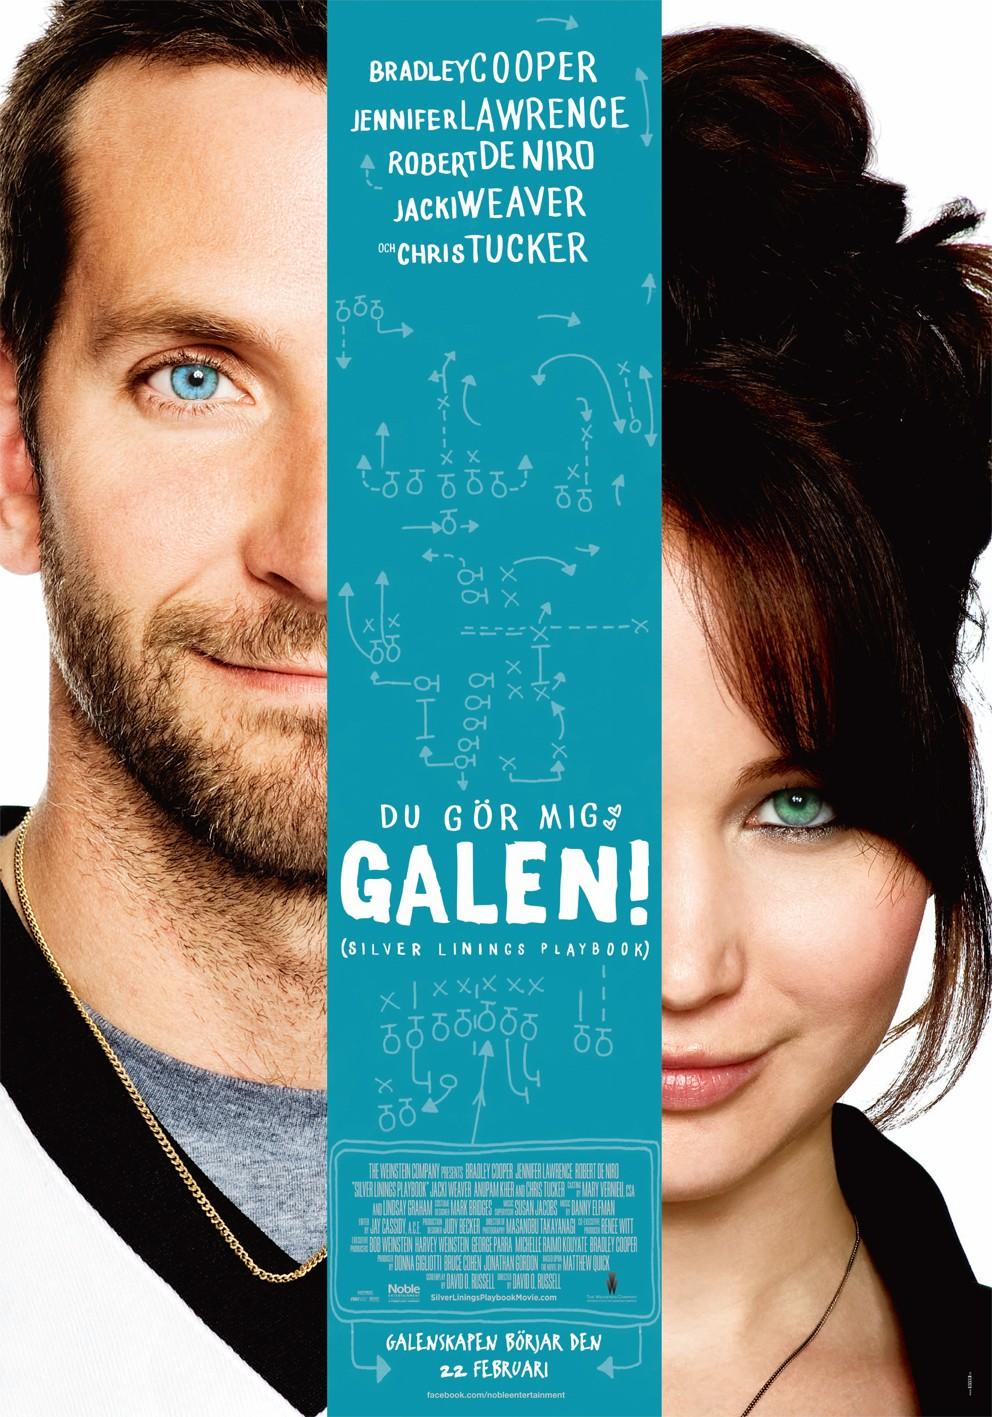 http://collider.com/wp-content/uploads/silver-linings-playbook-poster-international.jpg